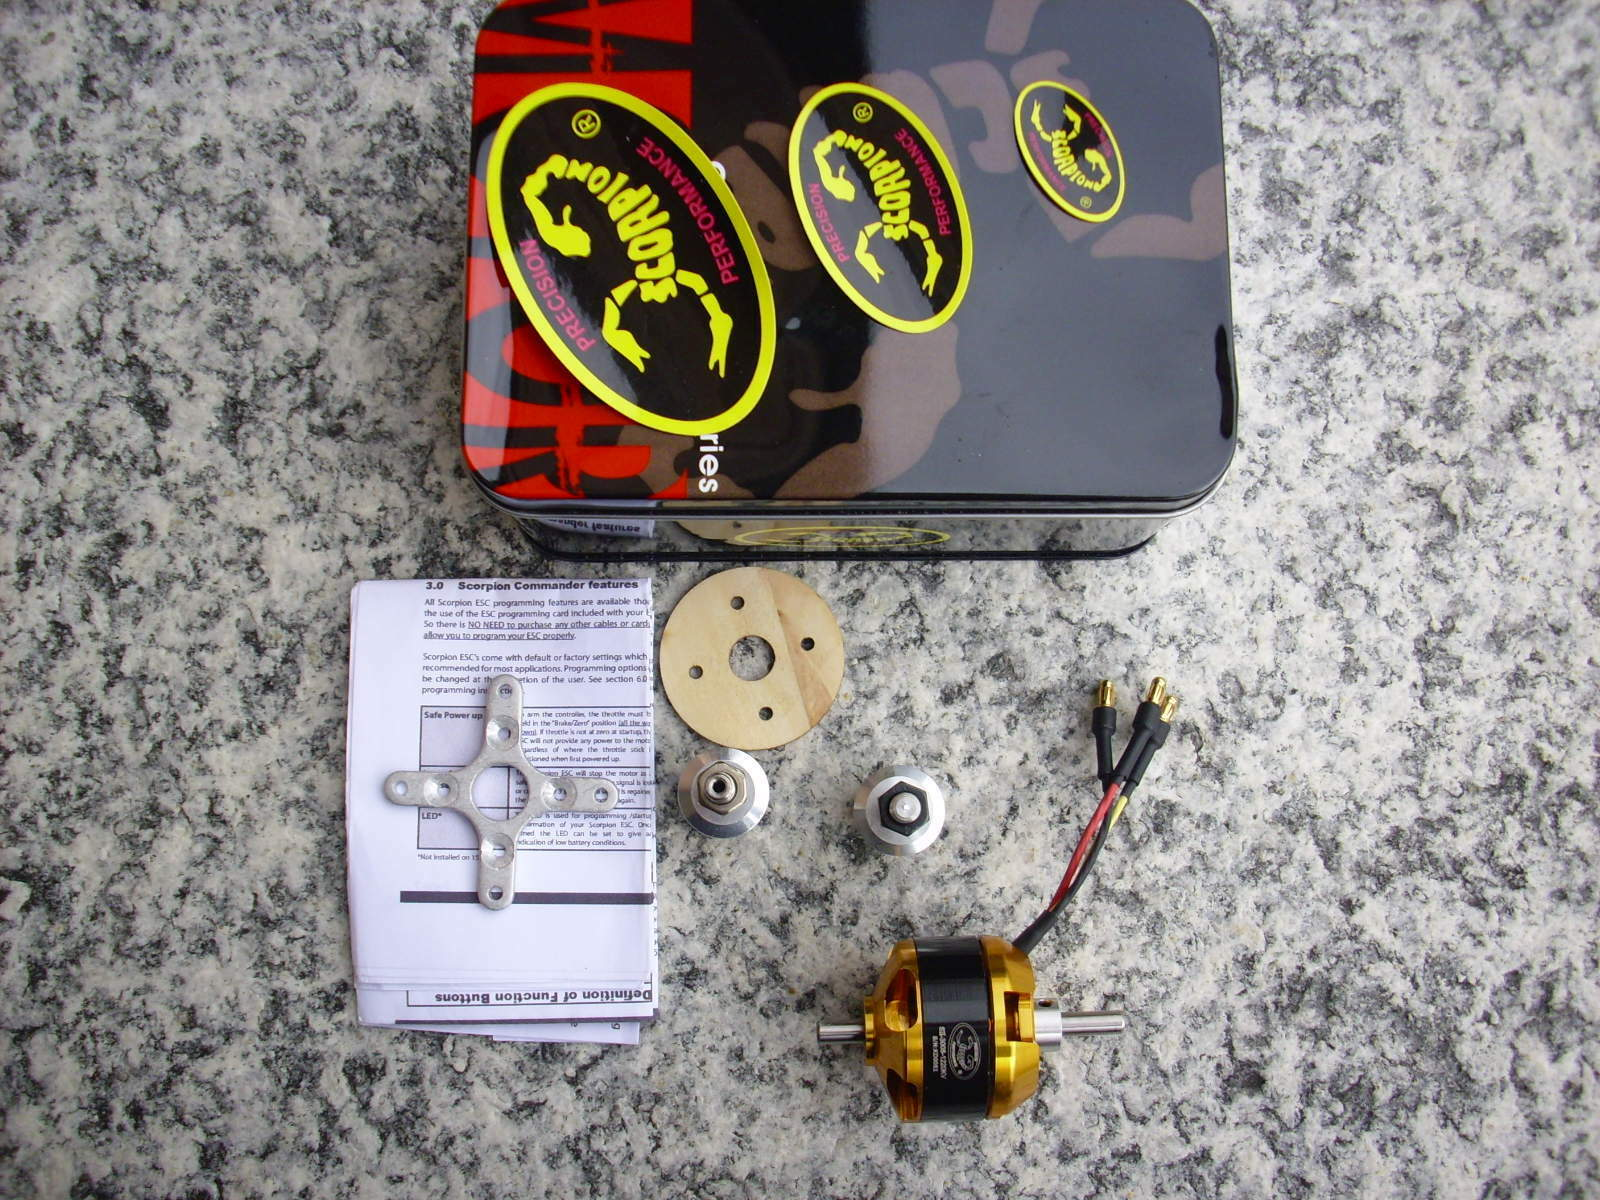 Scorpion SII-3008-1220 Brushless Motor, Kv=1220